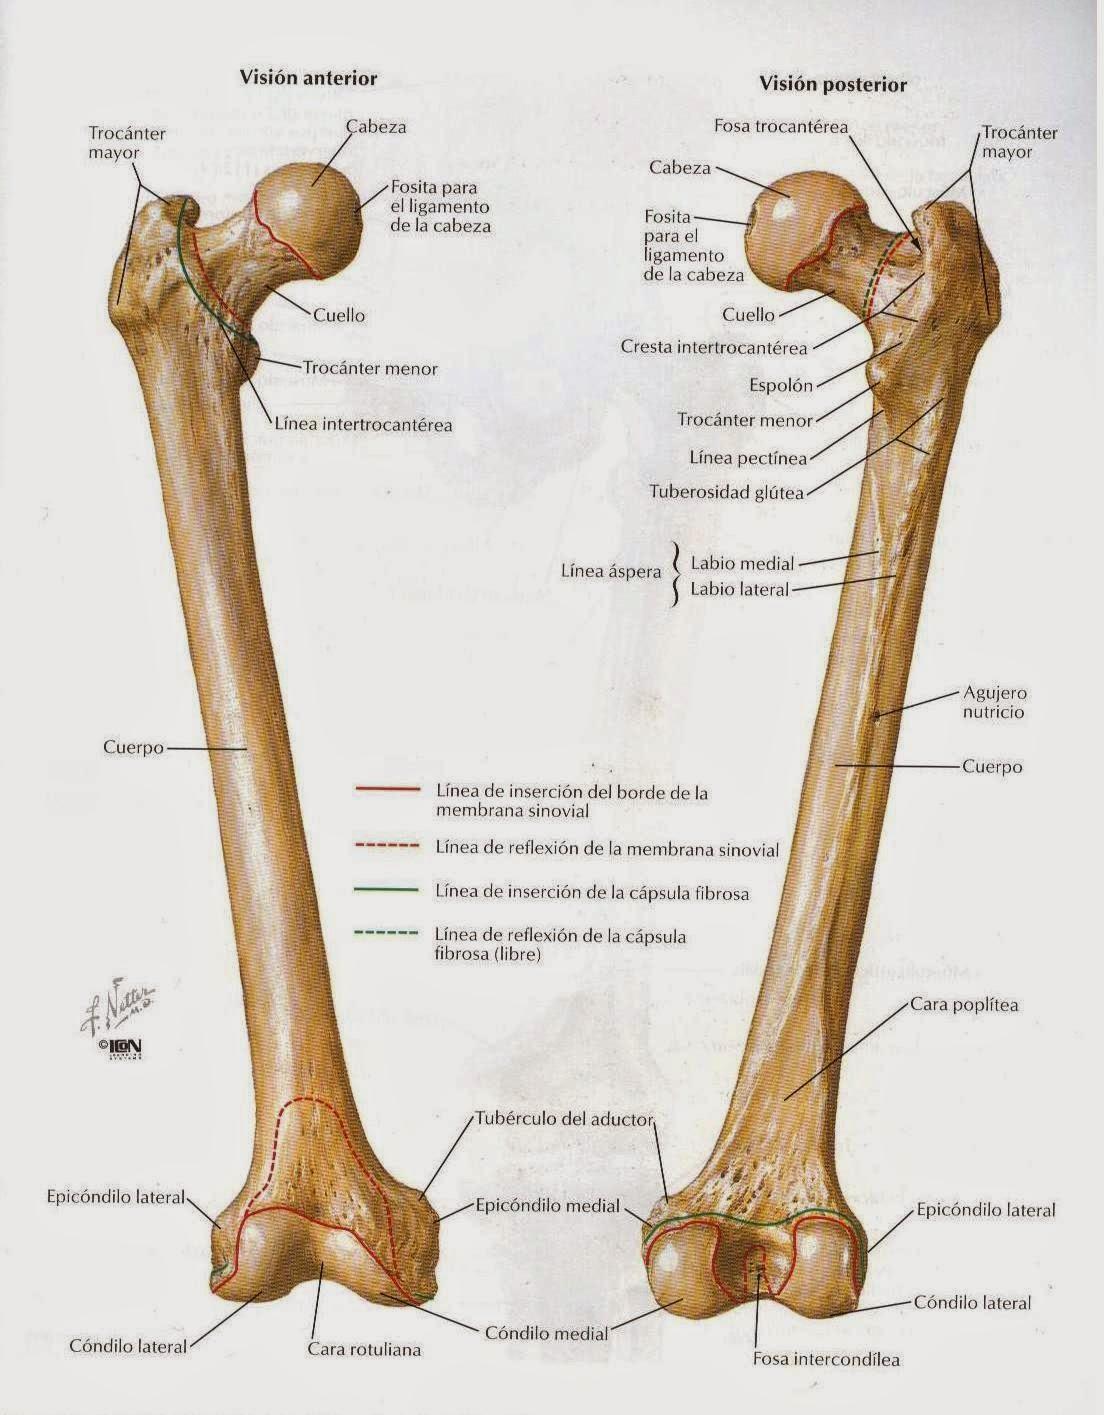 anatomíacaderayrodilla: diciembre 2014